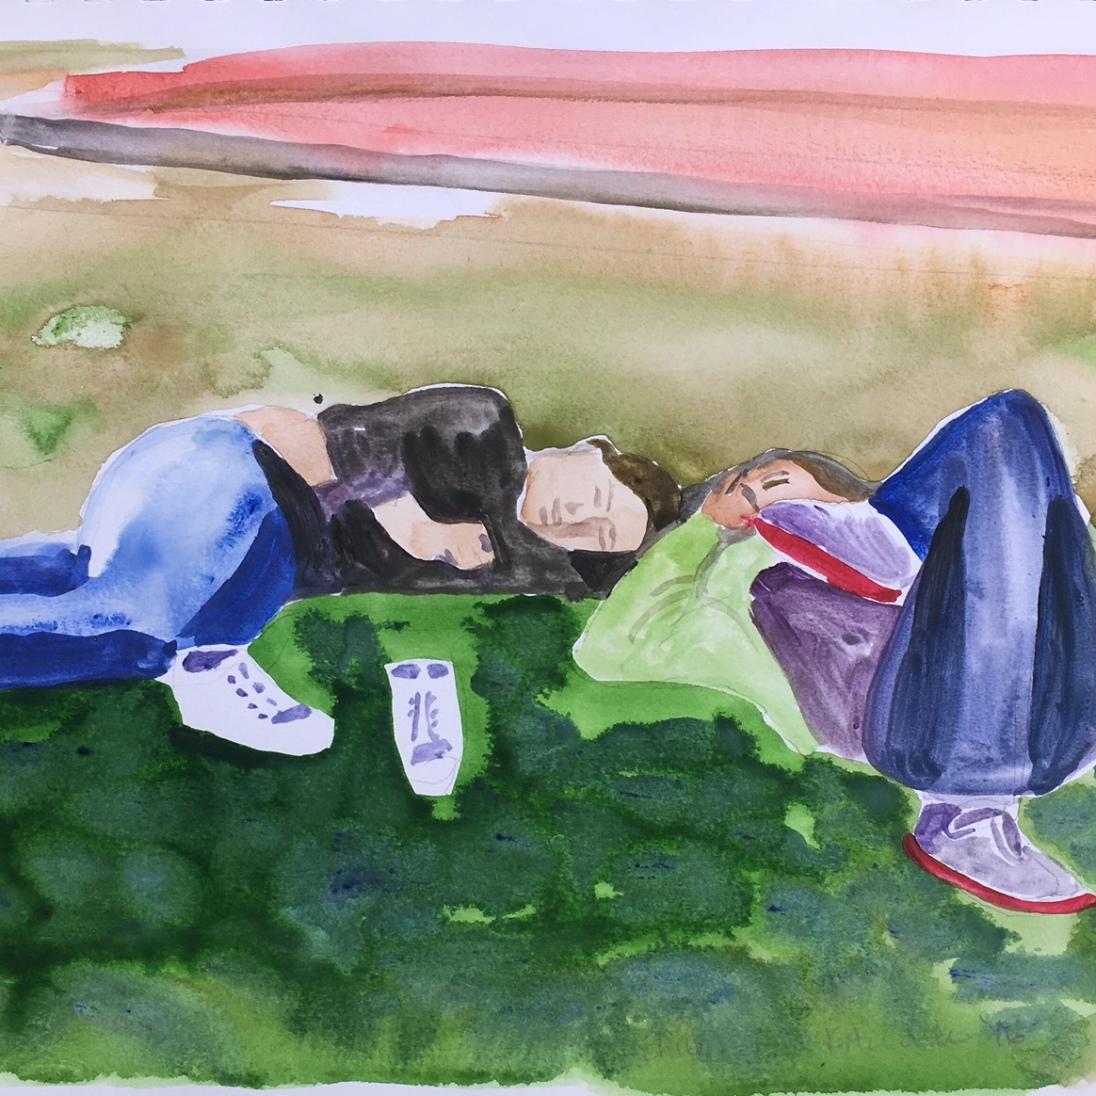 Niñas en la Plaza, Chile, watercolor on paper, 8 by 10 in. Emilia Kallock 2016